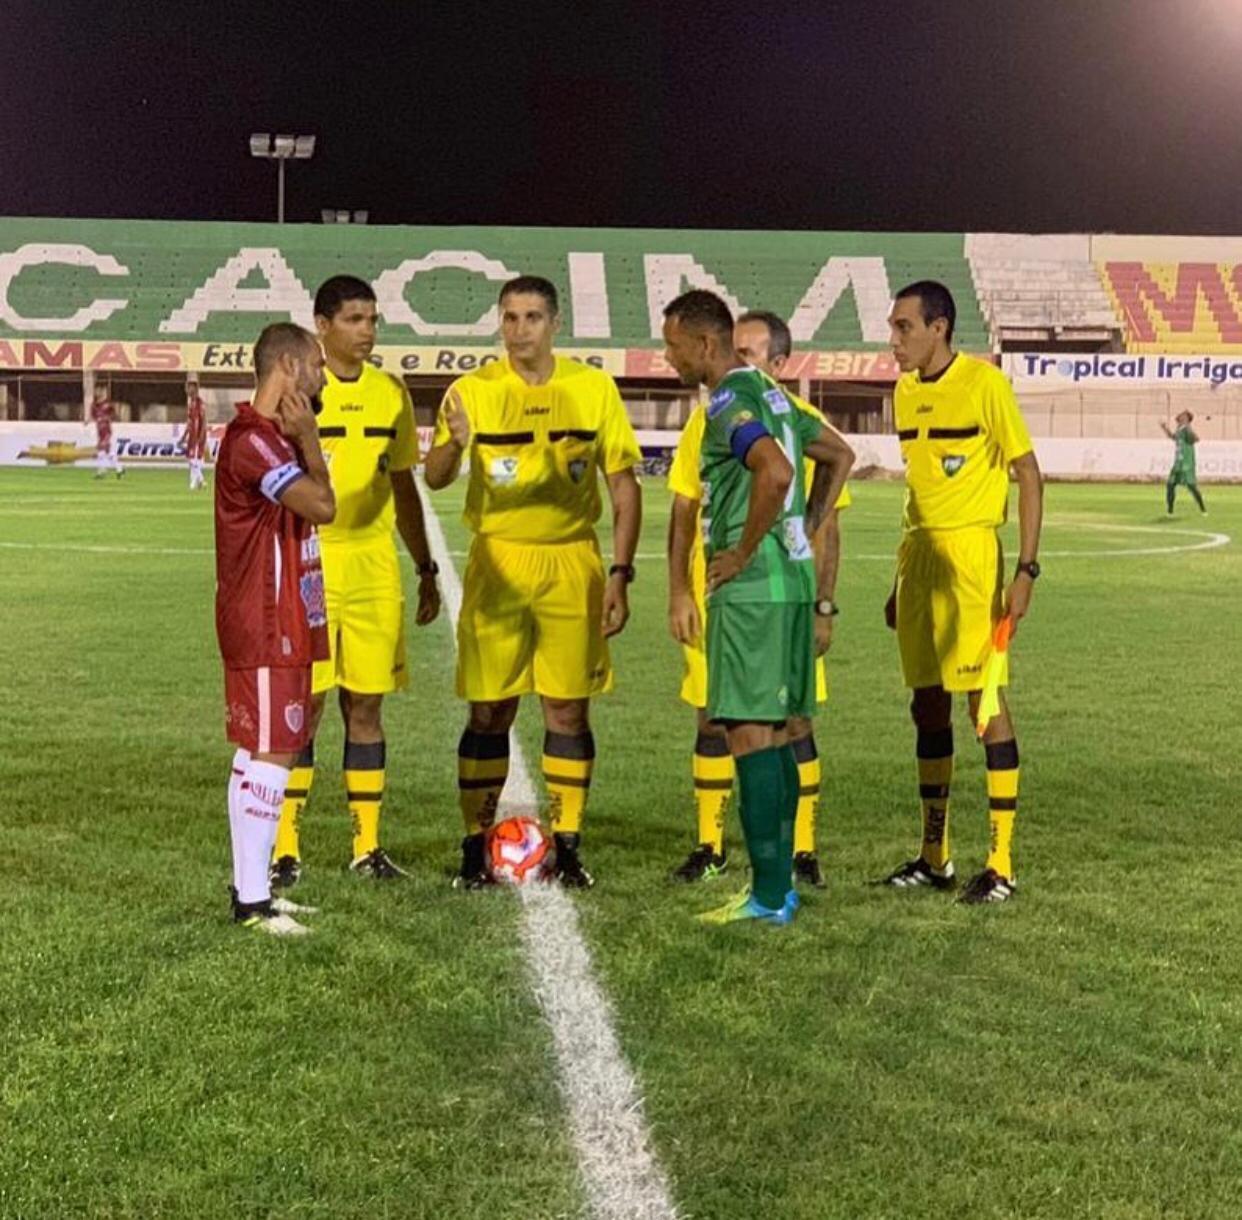 Potiguar x PalmeirasWhatsApp_Image_2019_01_10_at_00_39_52